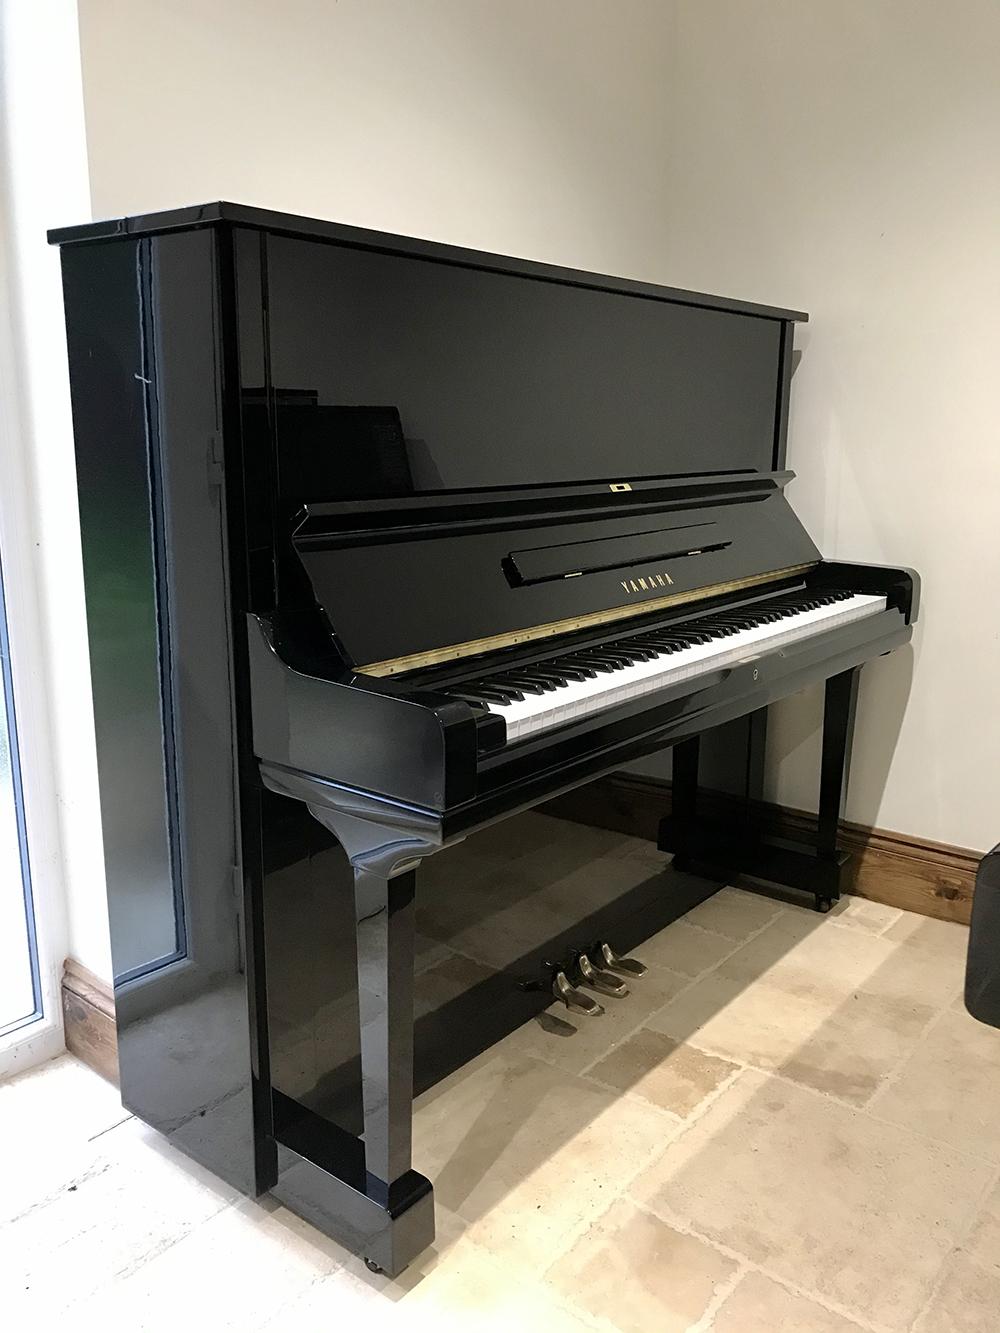 yamaha,u1,reconditioned,used,preloved,dorset,showroom,piano,upright